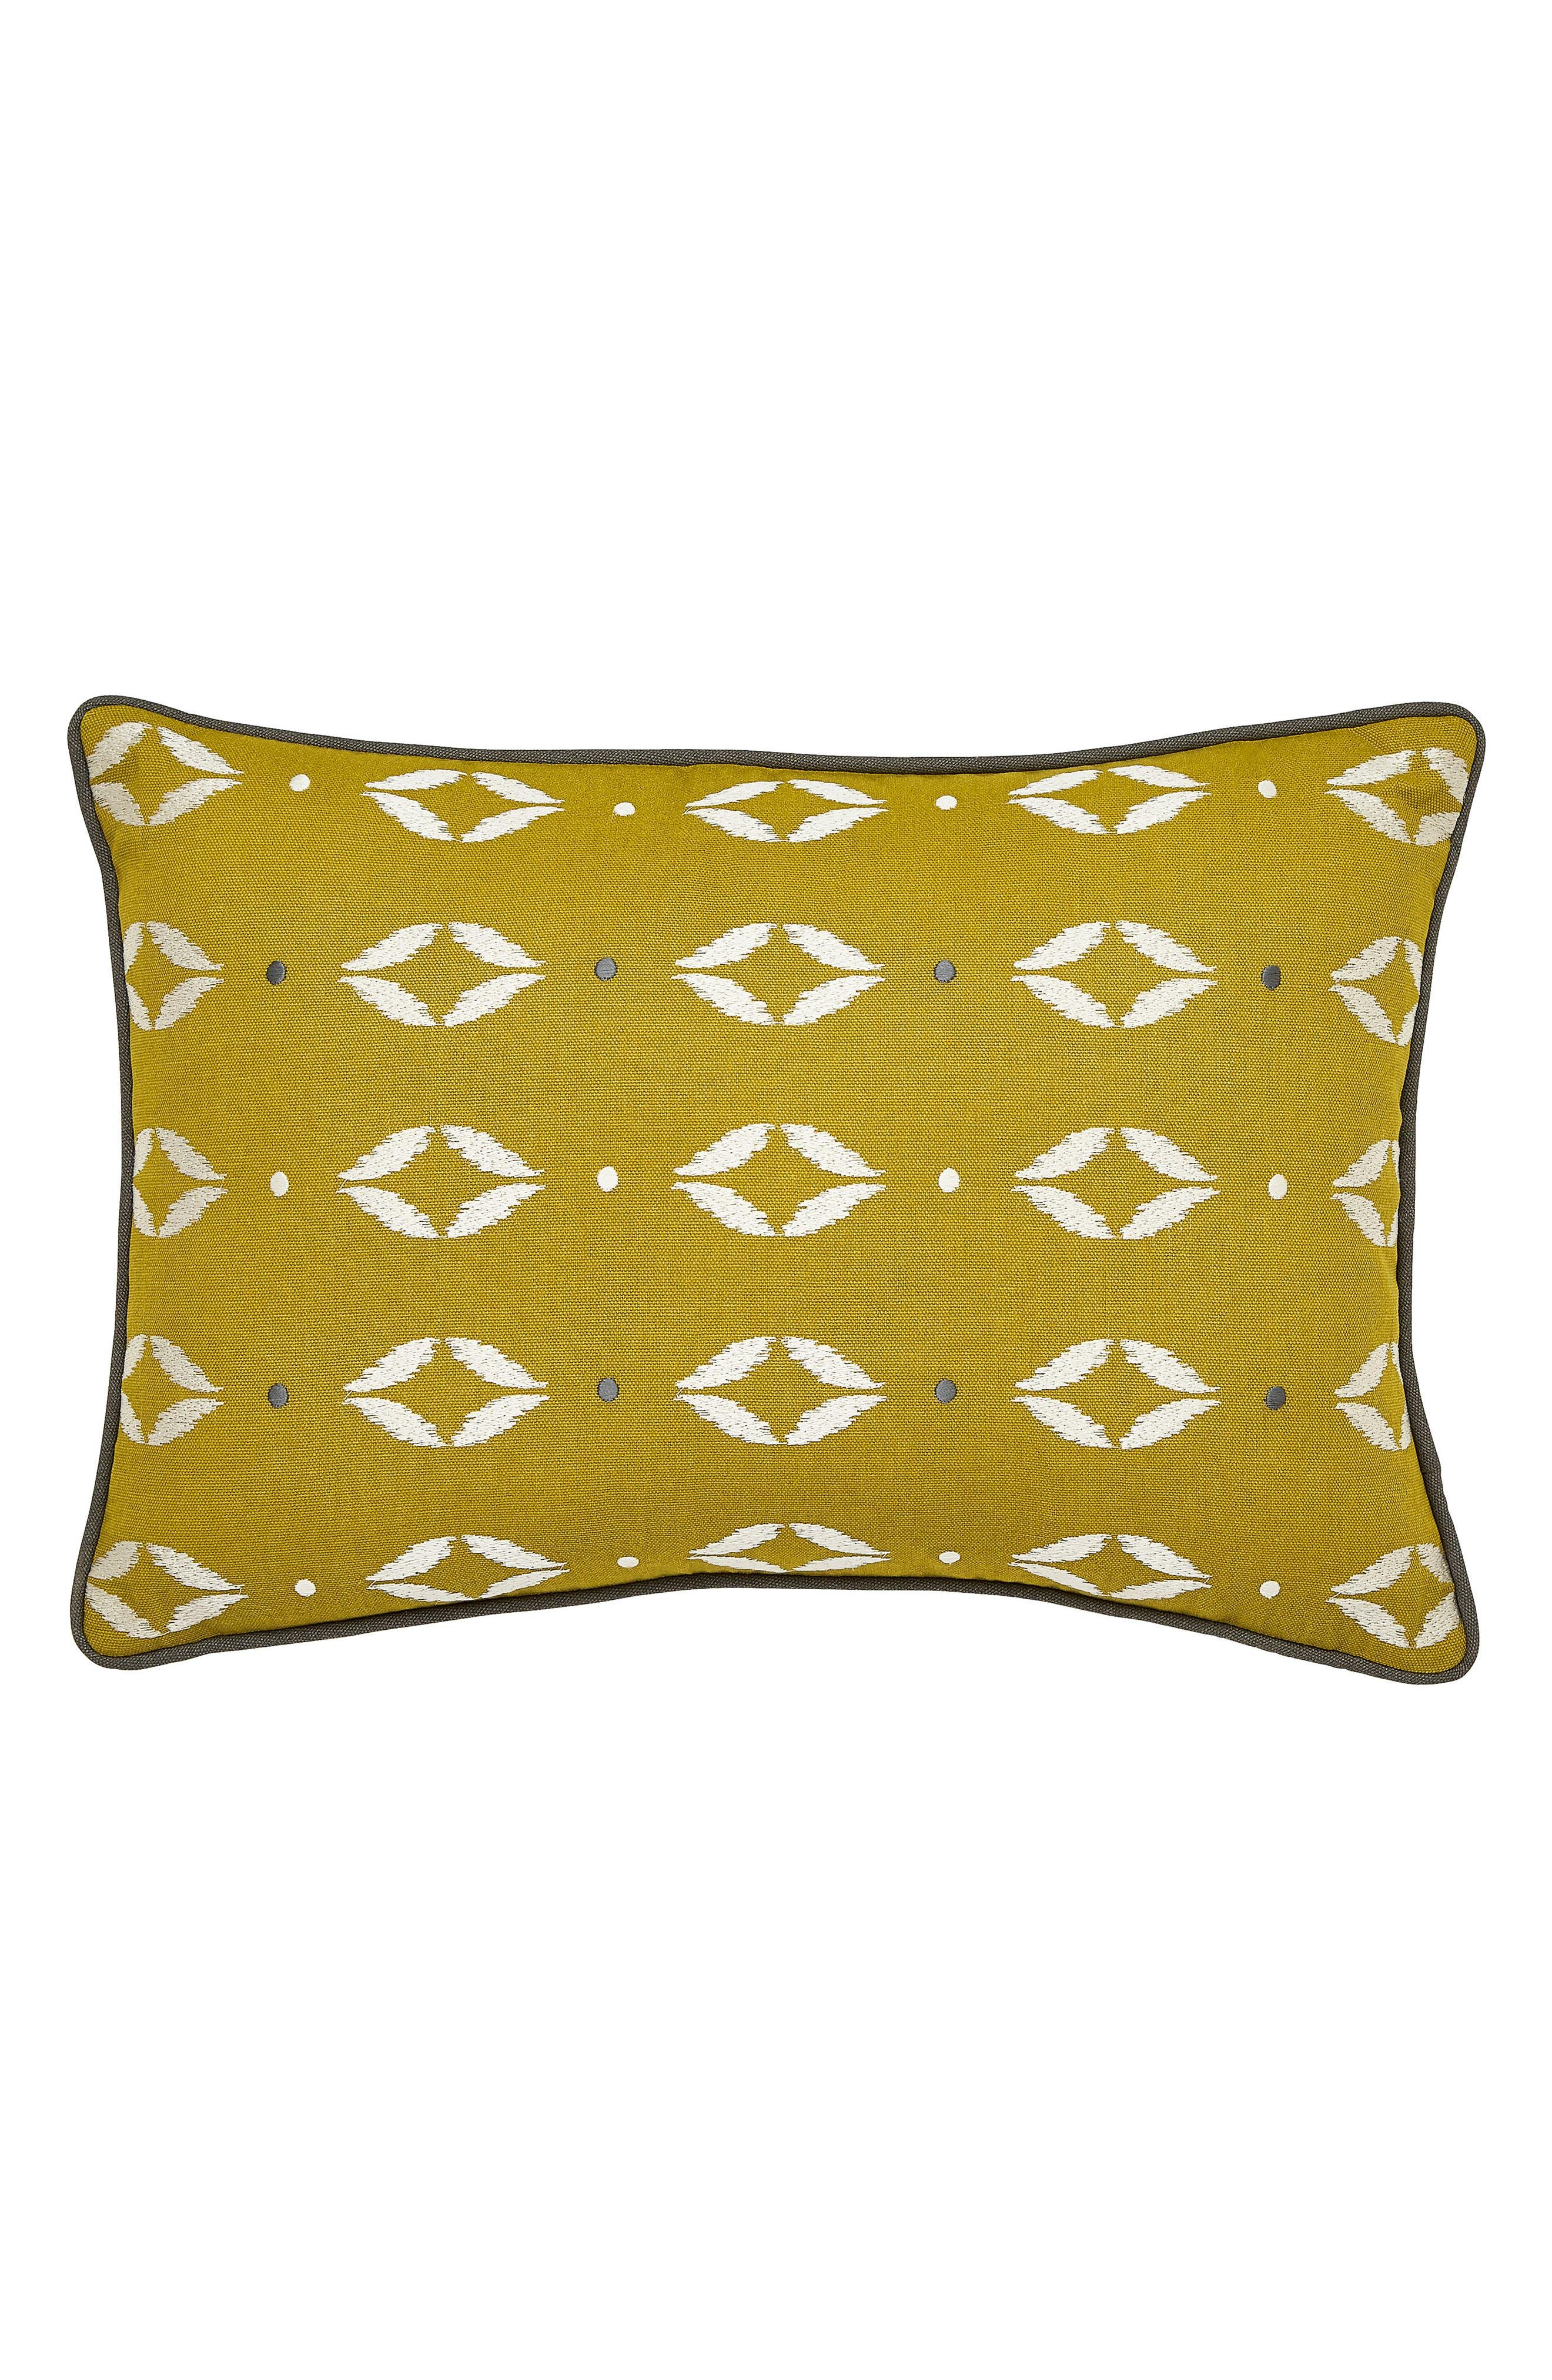 Ziba Duvet Cover, Sham & Accent Pillow Set,                             Alternate thumbnail 5, color,                             Grey